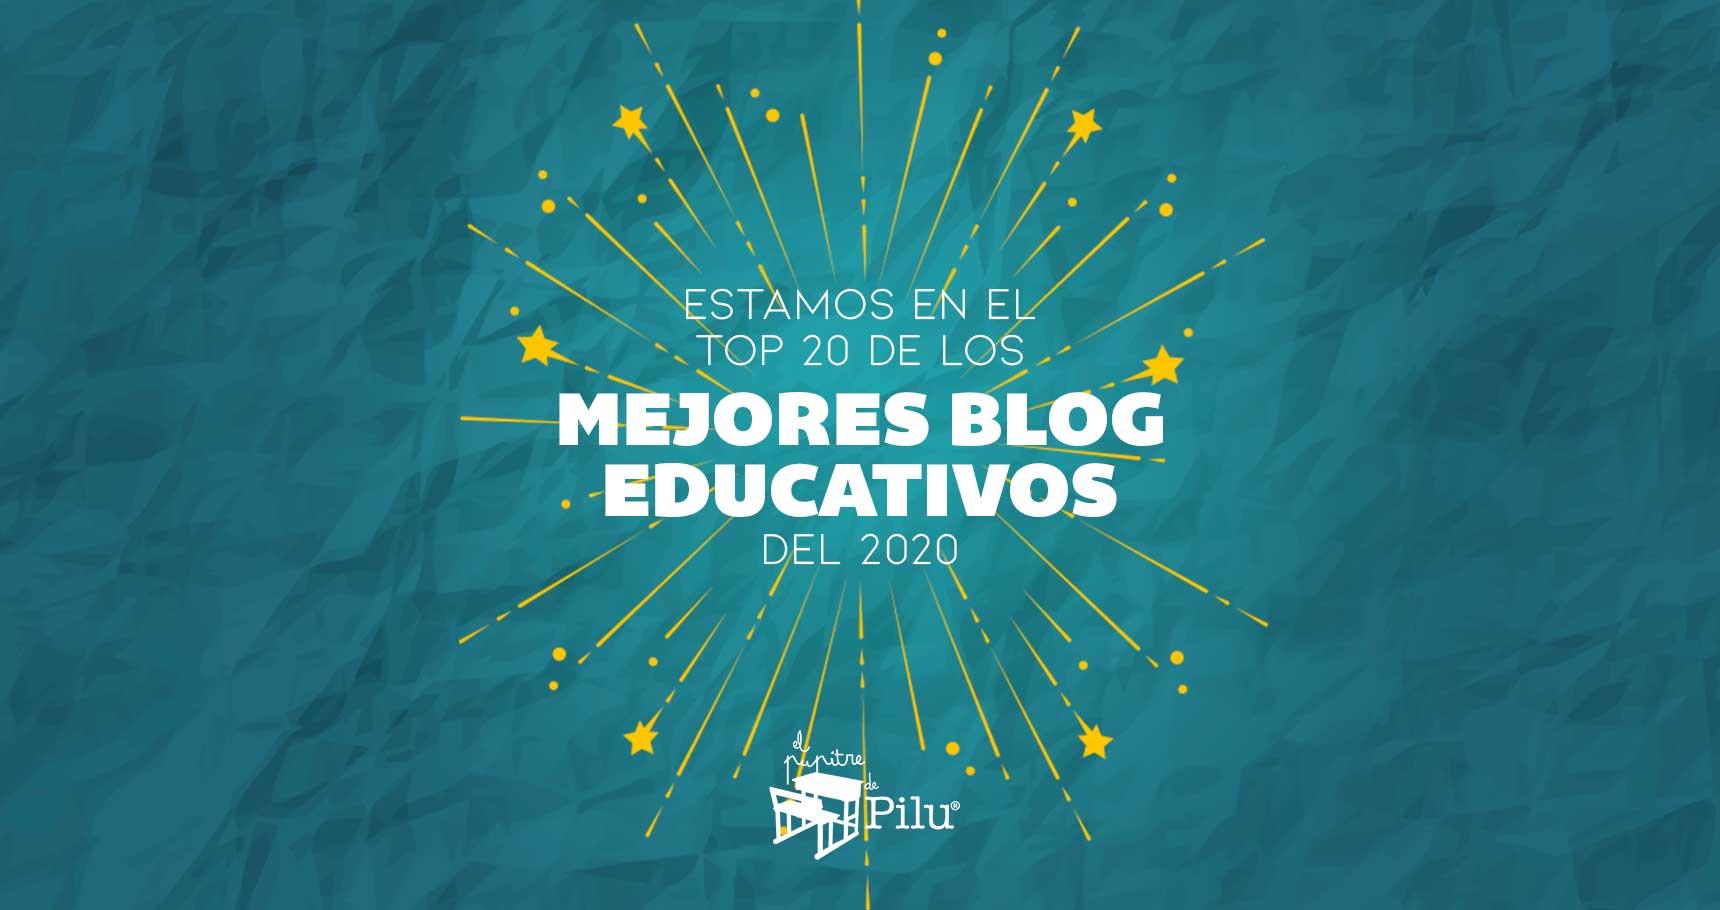 El pupitre entre los 20 mejores blogs